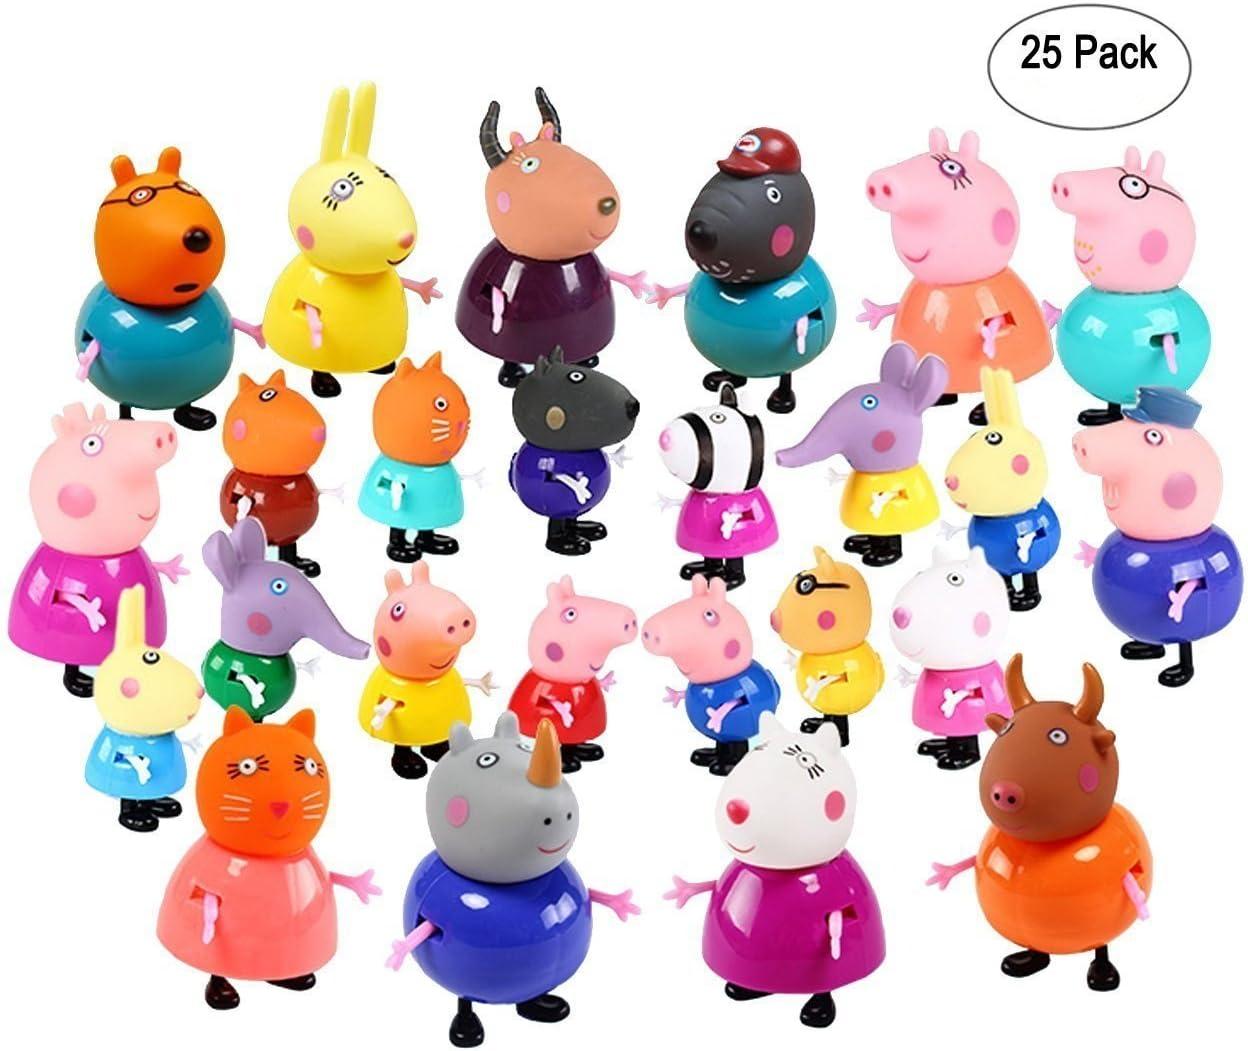 New Brand 25 Pcs/Set Cute Peppa Pig Figures 25 Cartoon Heroes Kids: Amazon.es: Juguetes y juegos